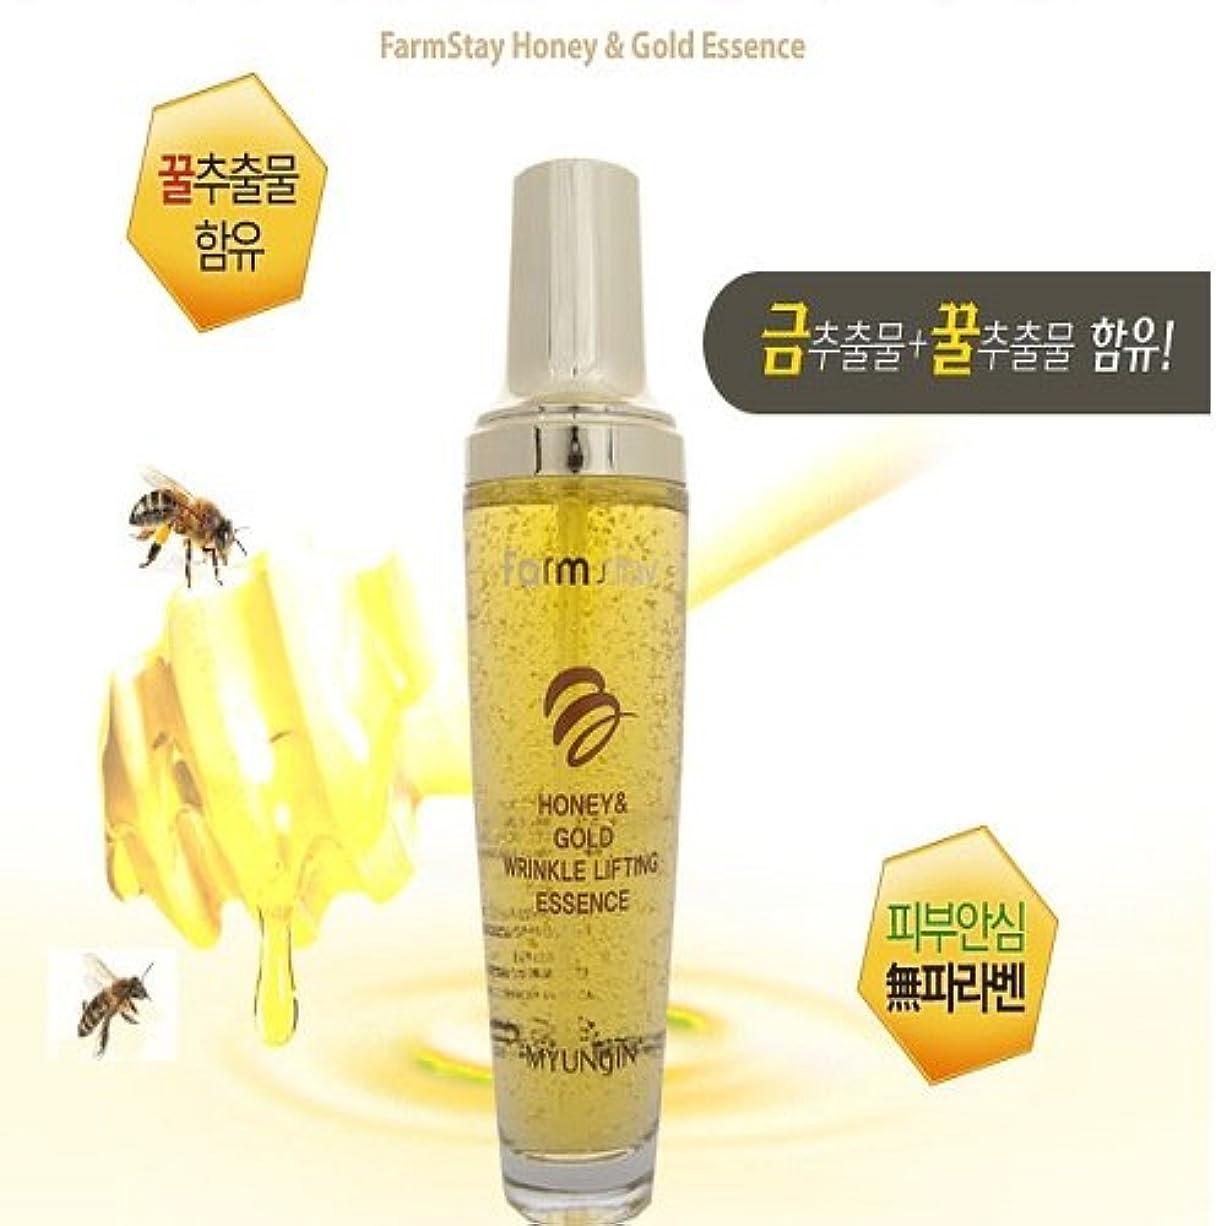 [FARM STAY] Honey & Gold Wrinkle Lifting Essence 130ml